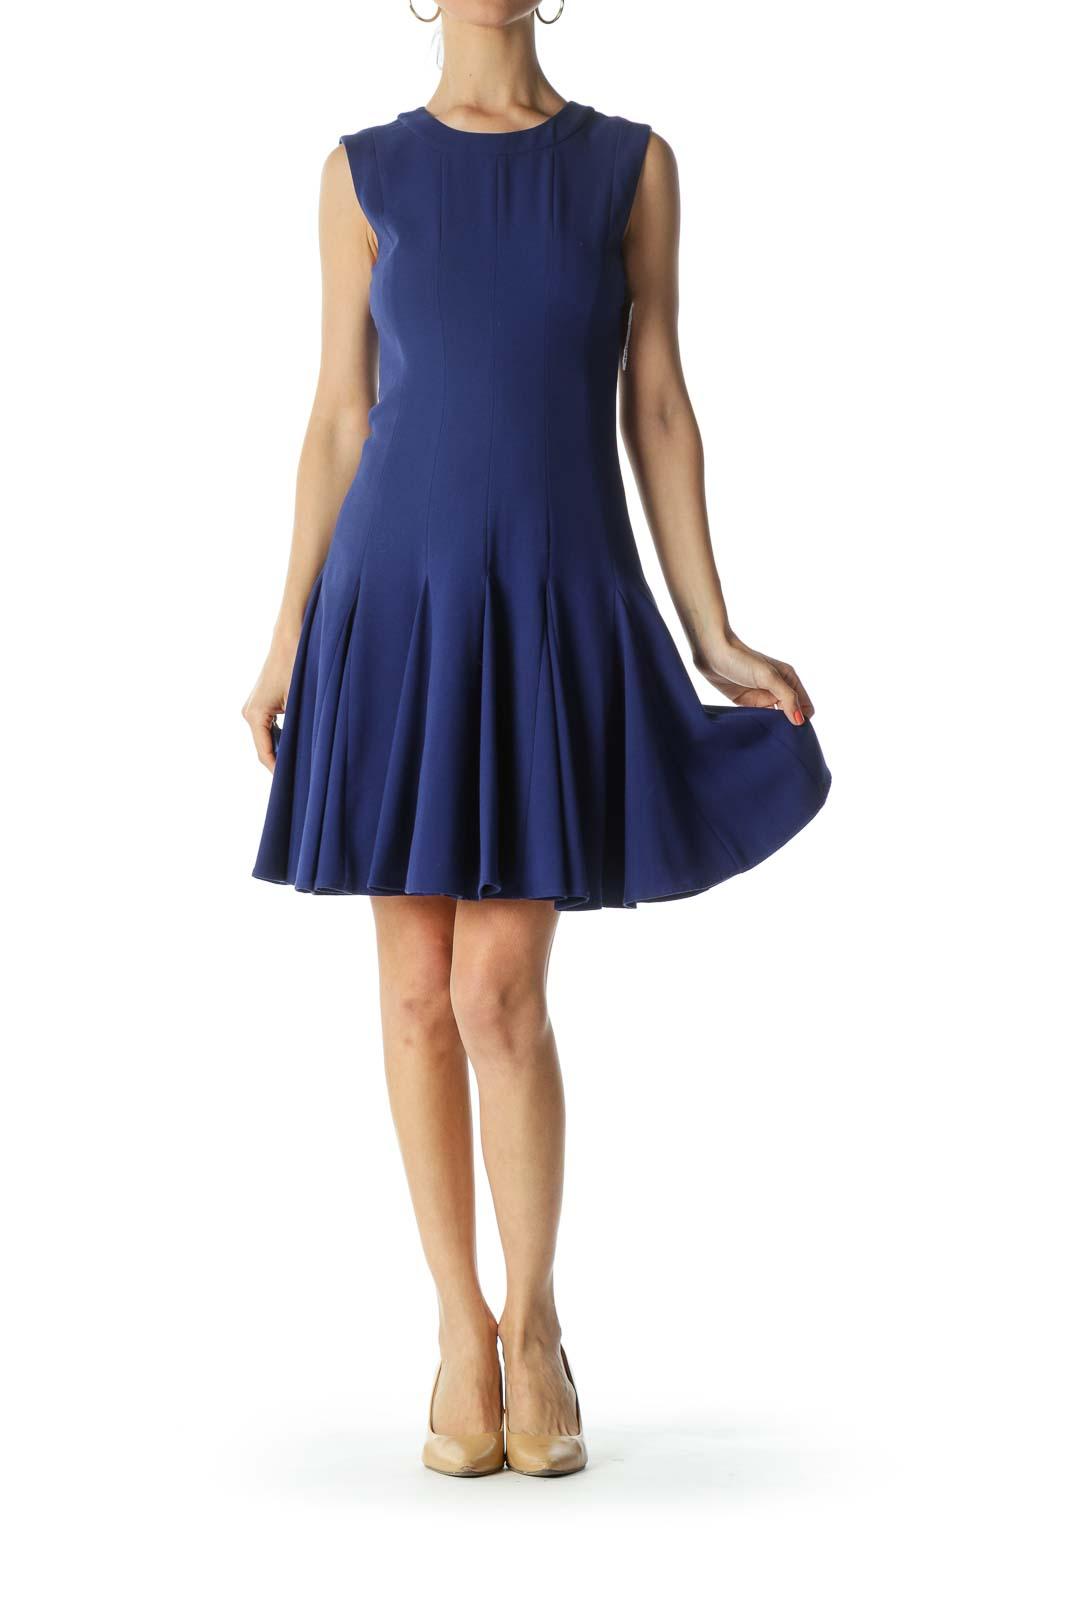 Blue Round-Neck Sleeveless Pleated-Bottom Work Dress